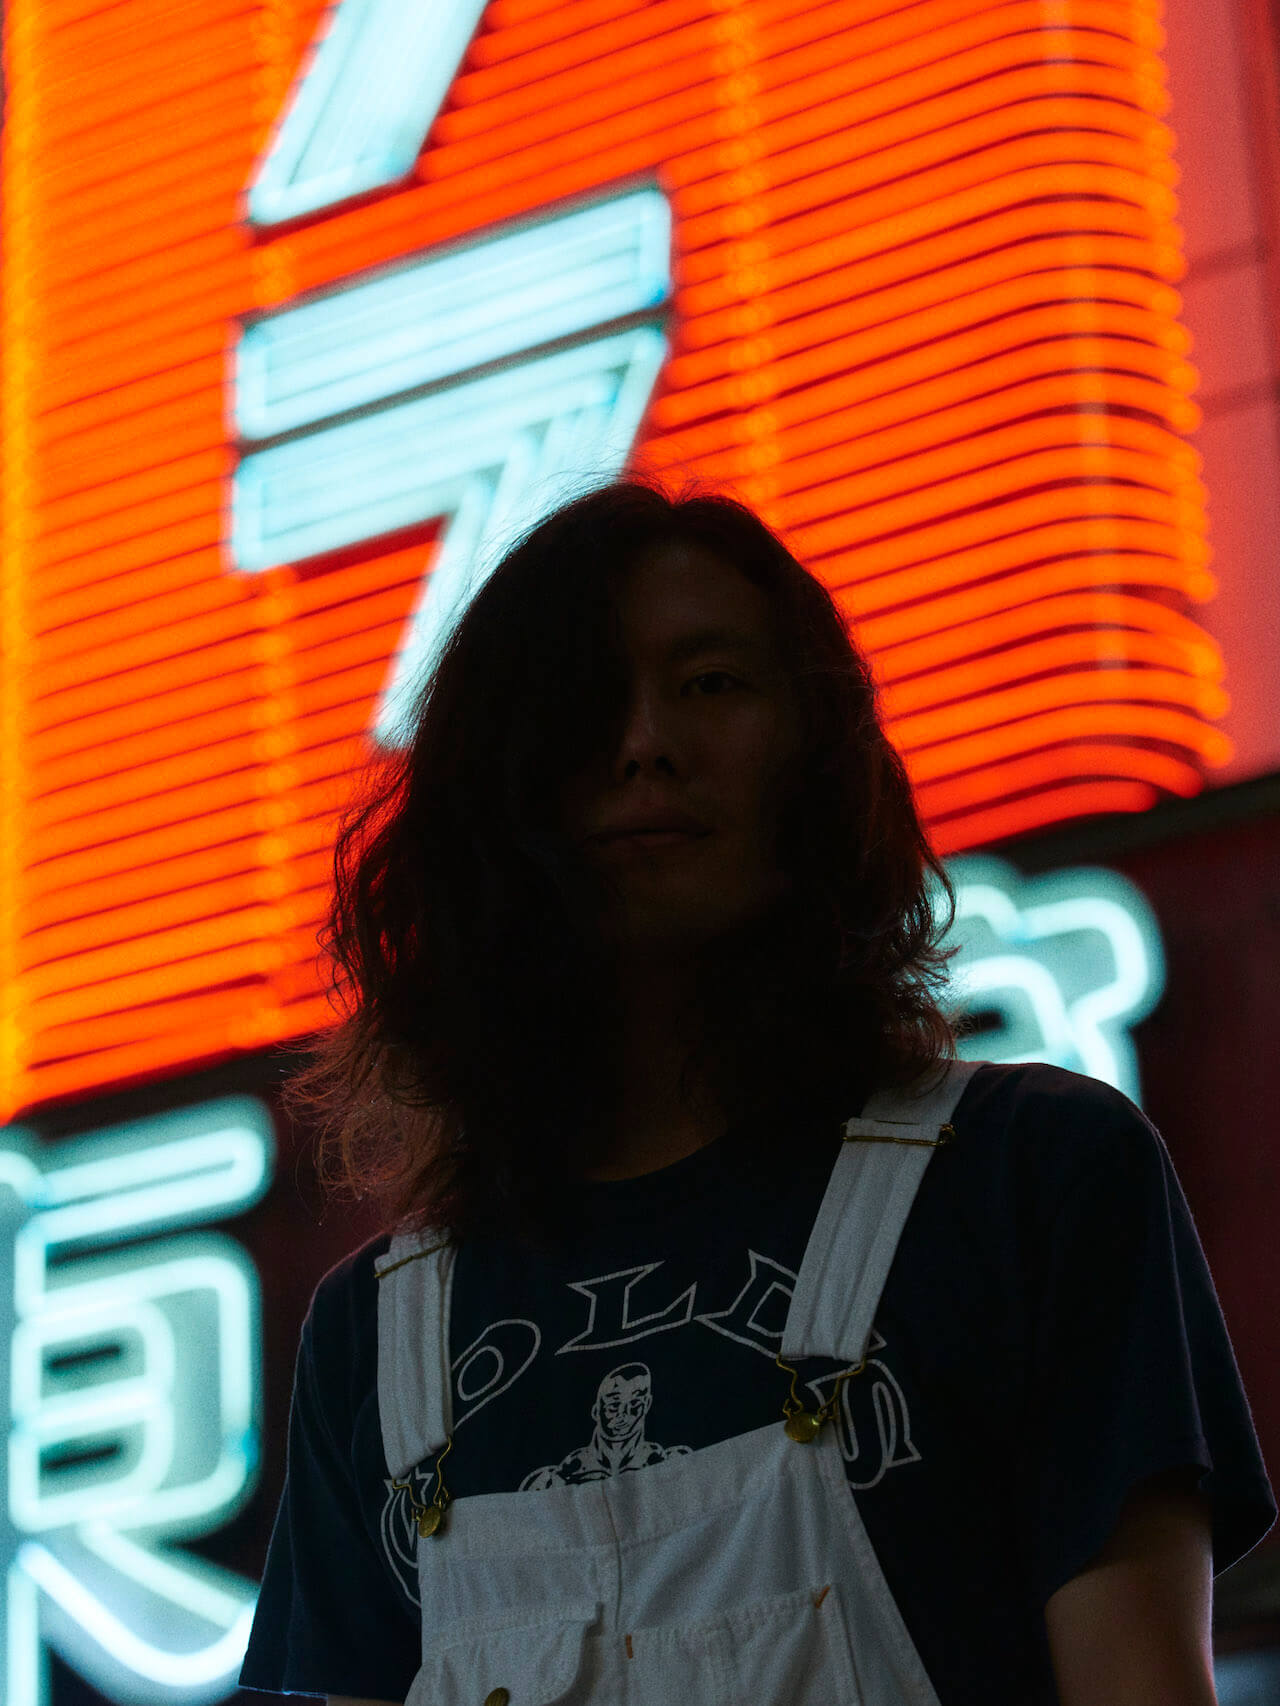 TENDOUJI×フジロック|東京オルタナシーン屈指の愛されバンドに訊く、フジロック初出演の意気込み interview190722-tendouji-4